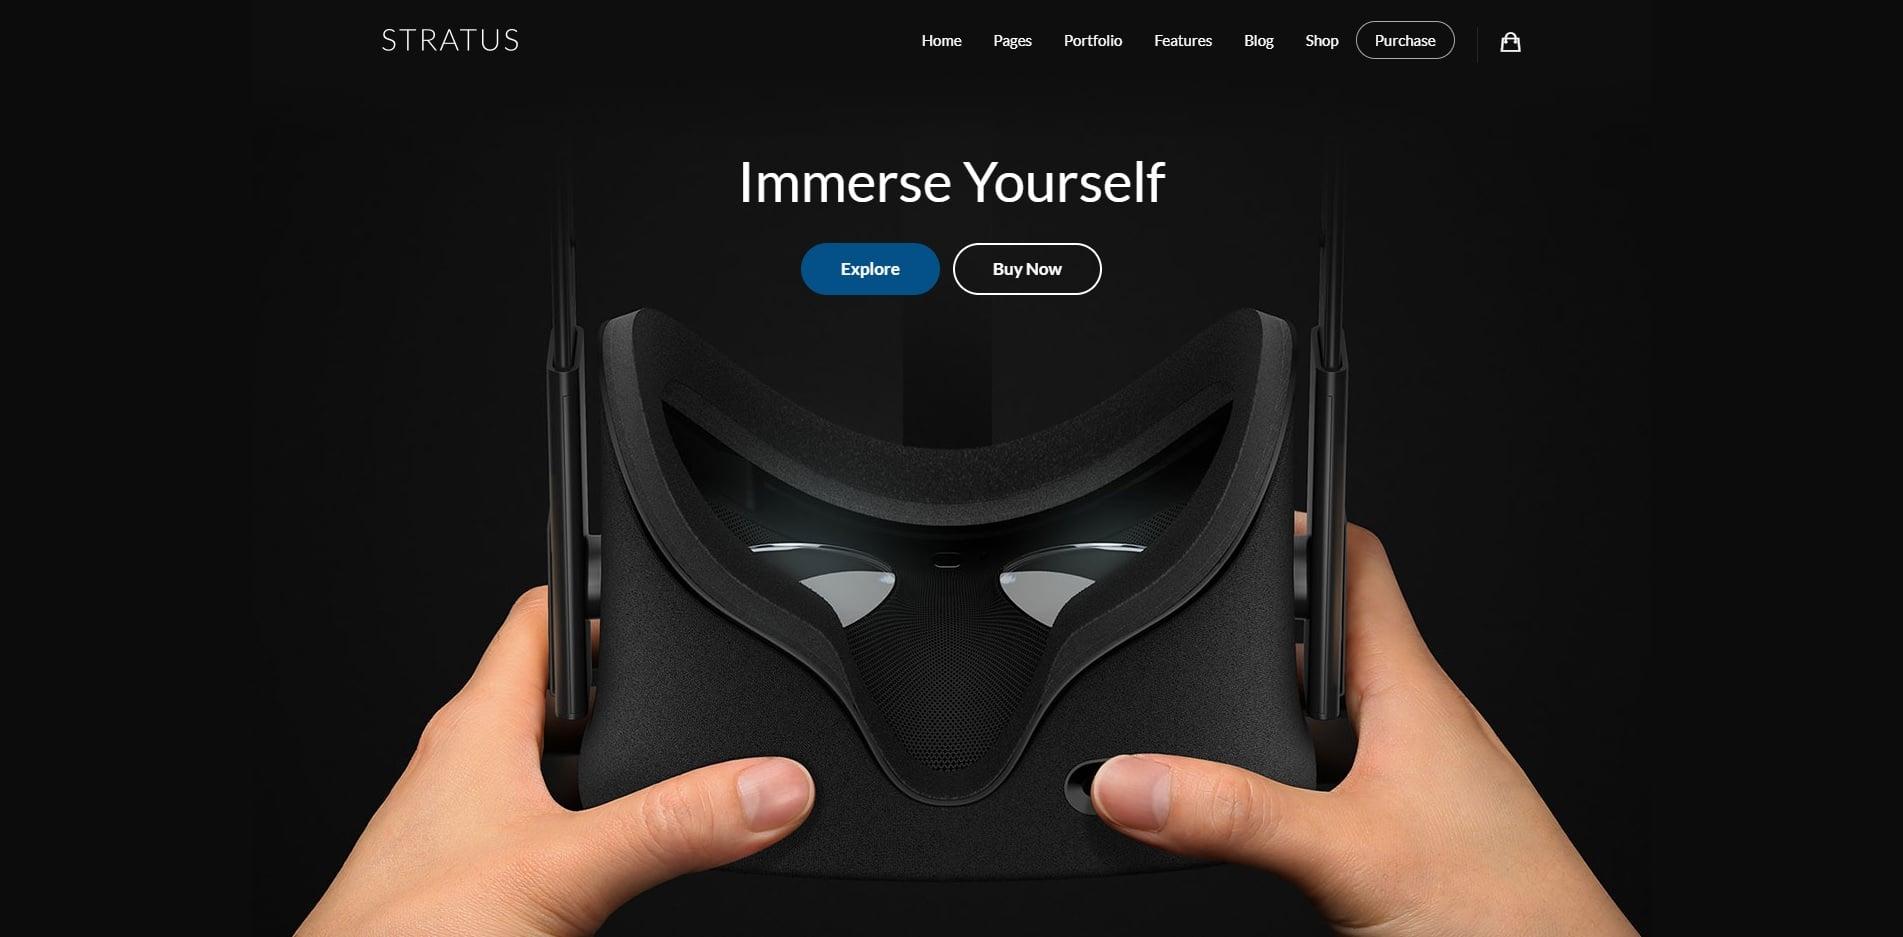 stratus technology website template